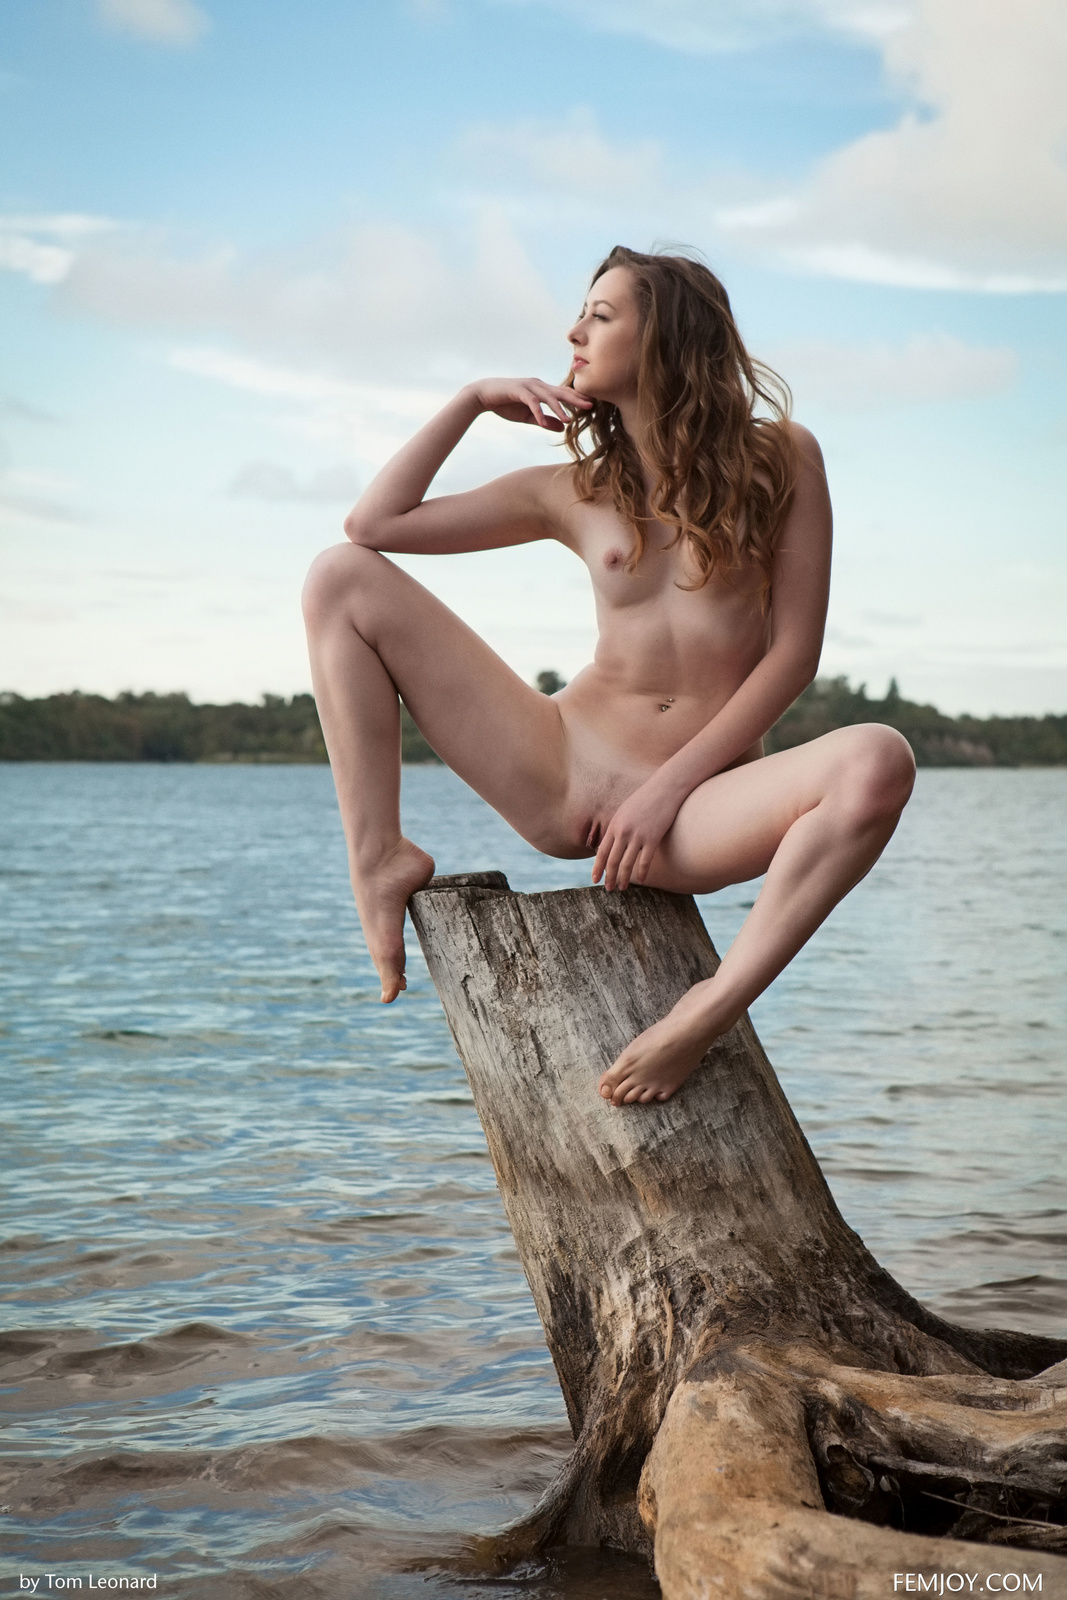 Zdjęcie porno - 064 - Zgrabna i naga laska nad jeziorkiem